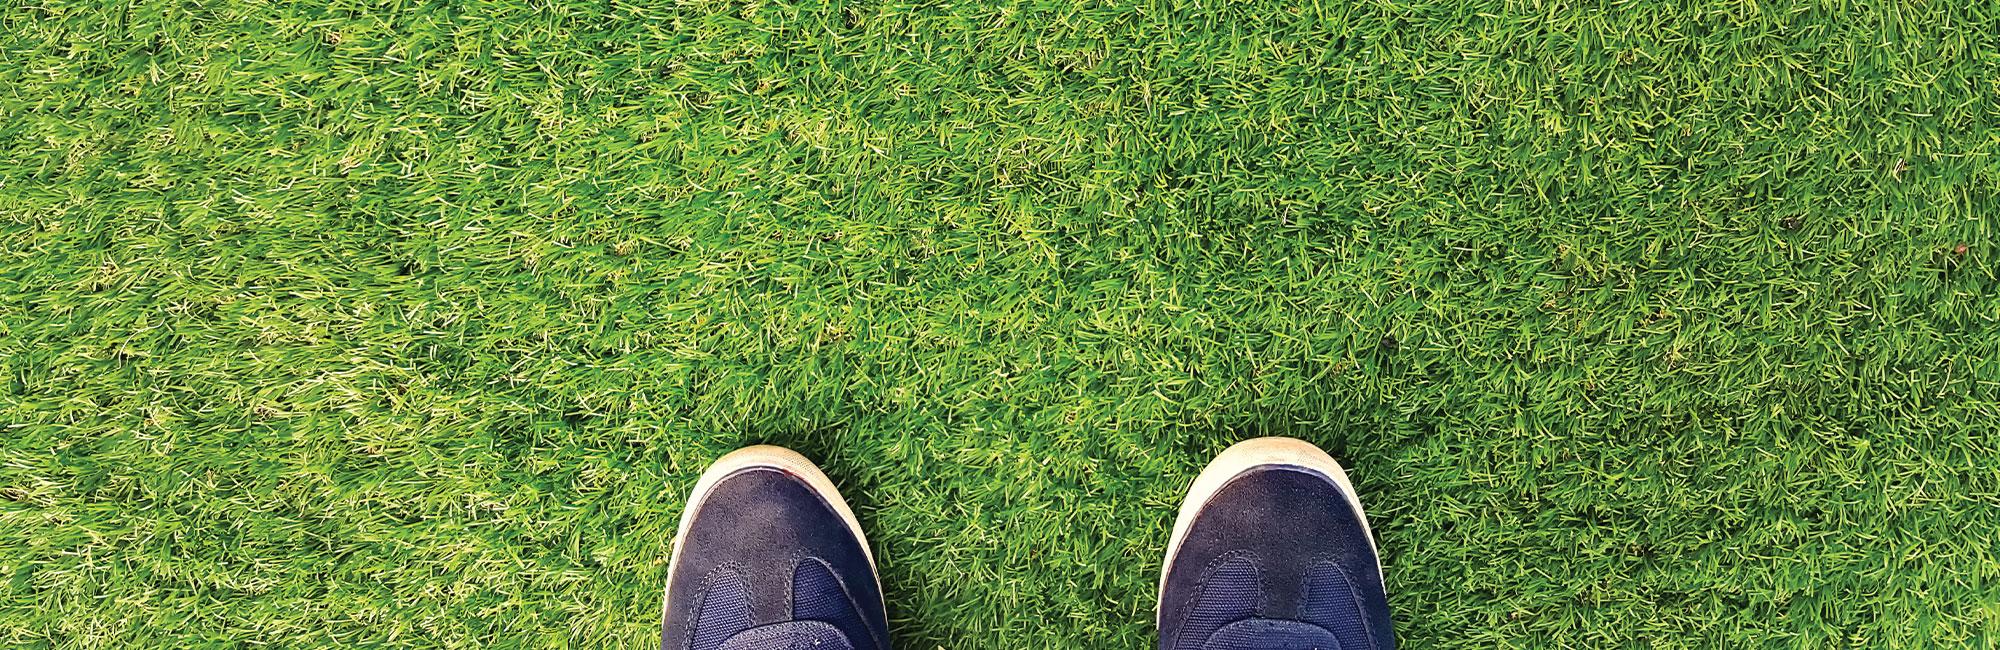 TURF nerd DFW | Keeping You Green All Year Long